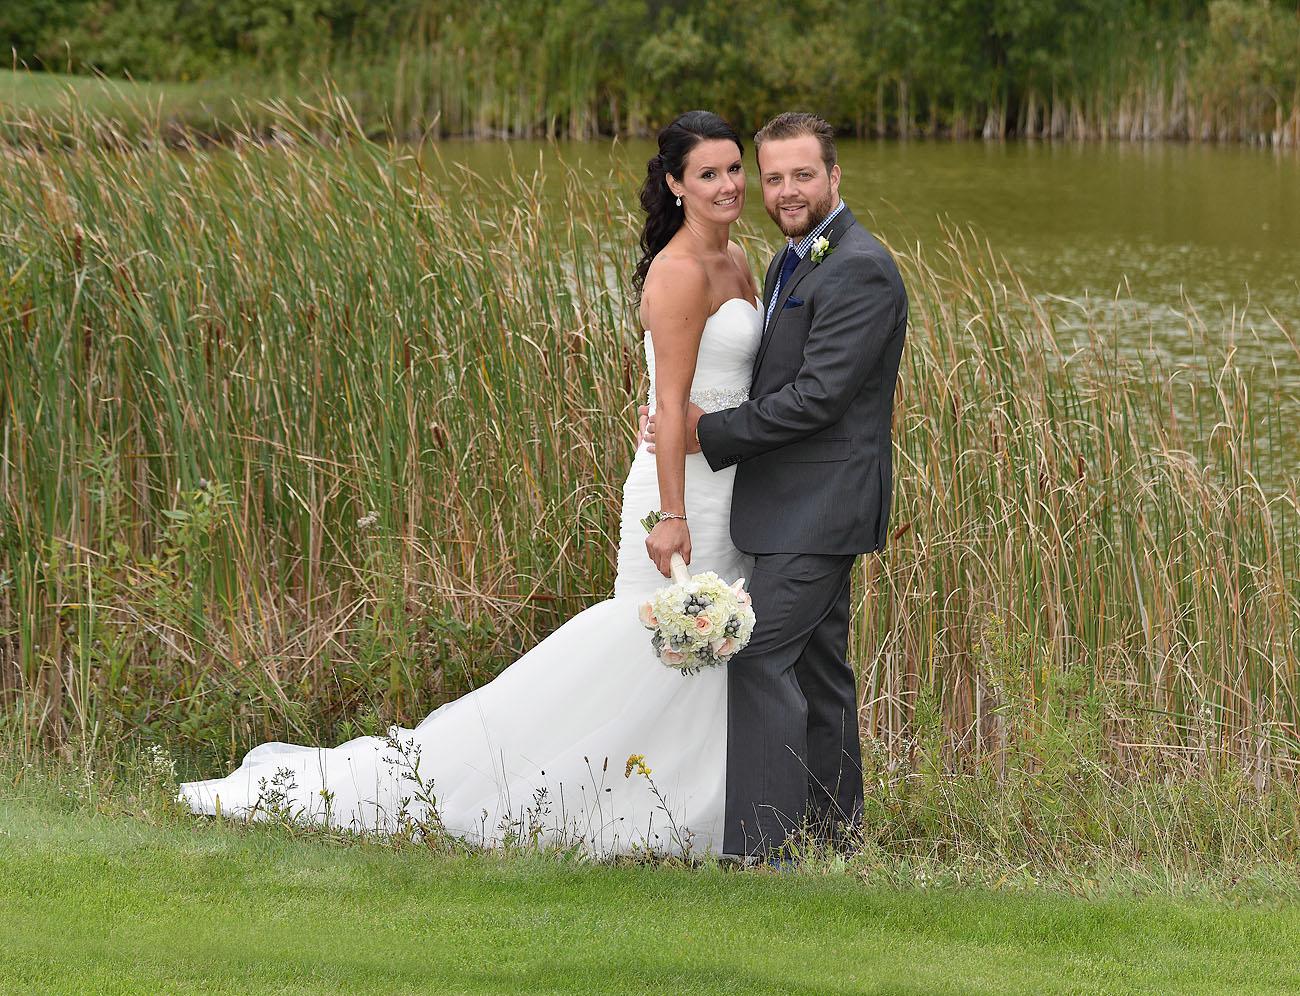 wasaga beach wedding photographer ali and royan testimonial